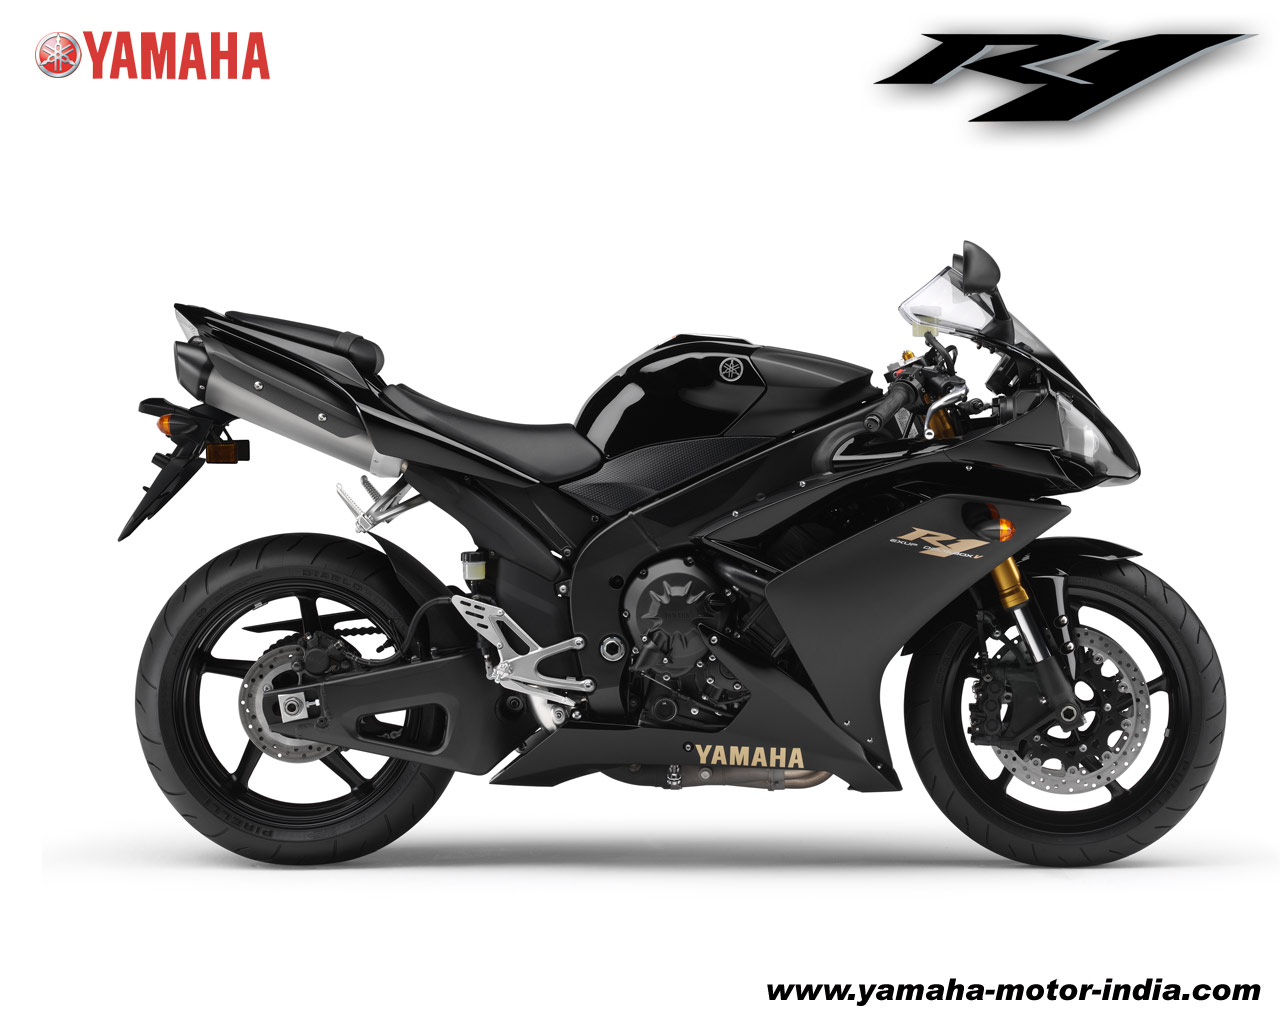 Yamaha R1 Wallpaper 6769 Hd Wallpapers in Bikes   Imagescicom 1280x1024